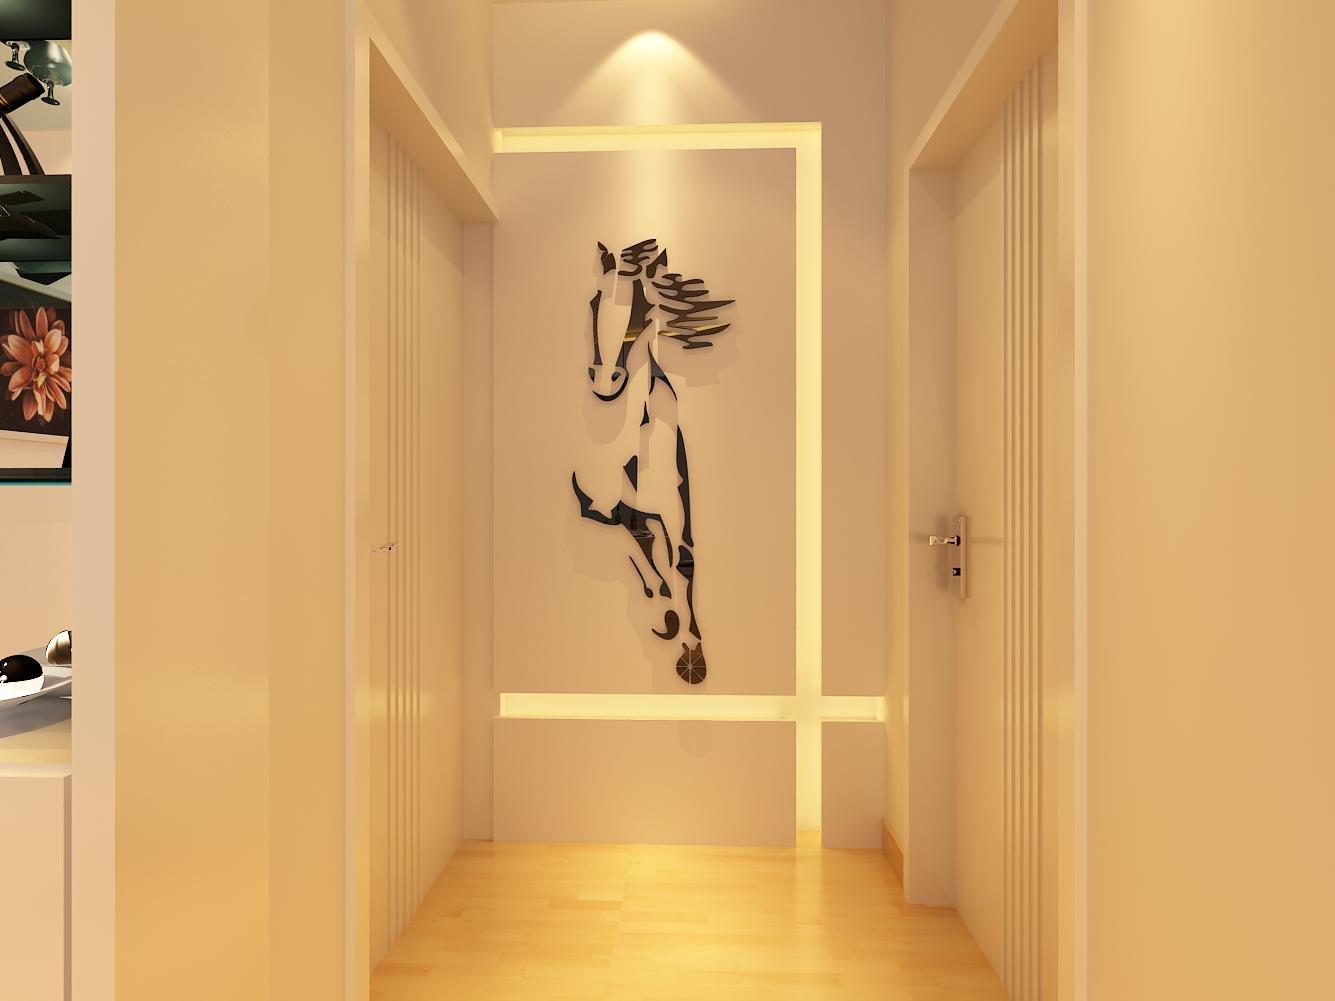 Amazon.com: 3d Running caballos murales de pared para sala ...